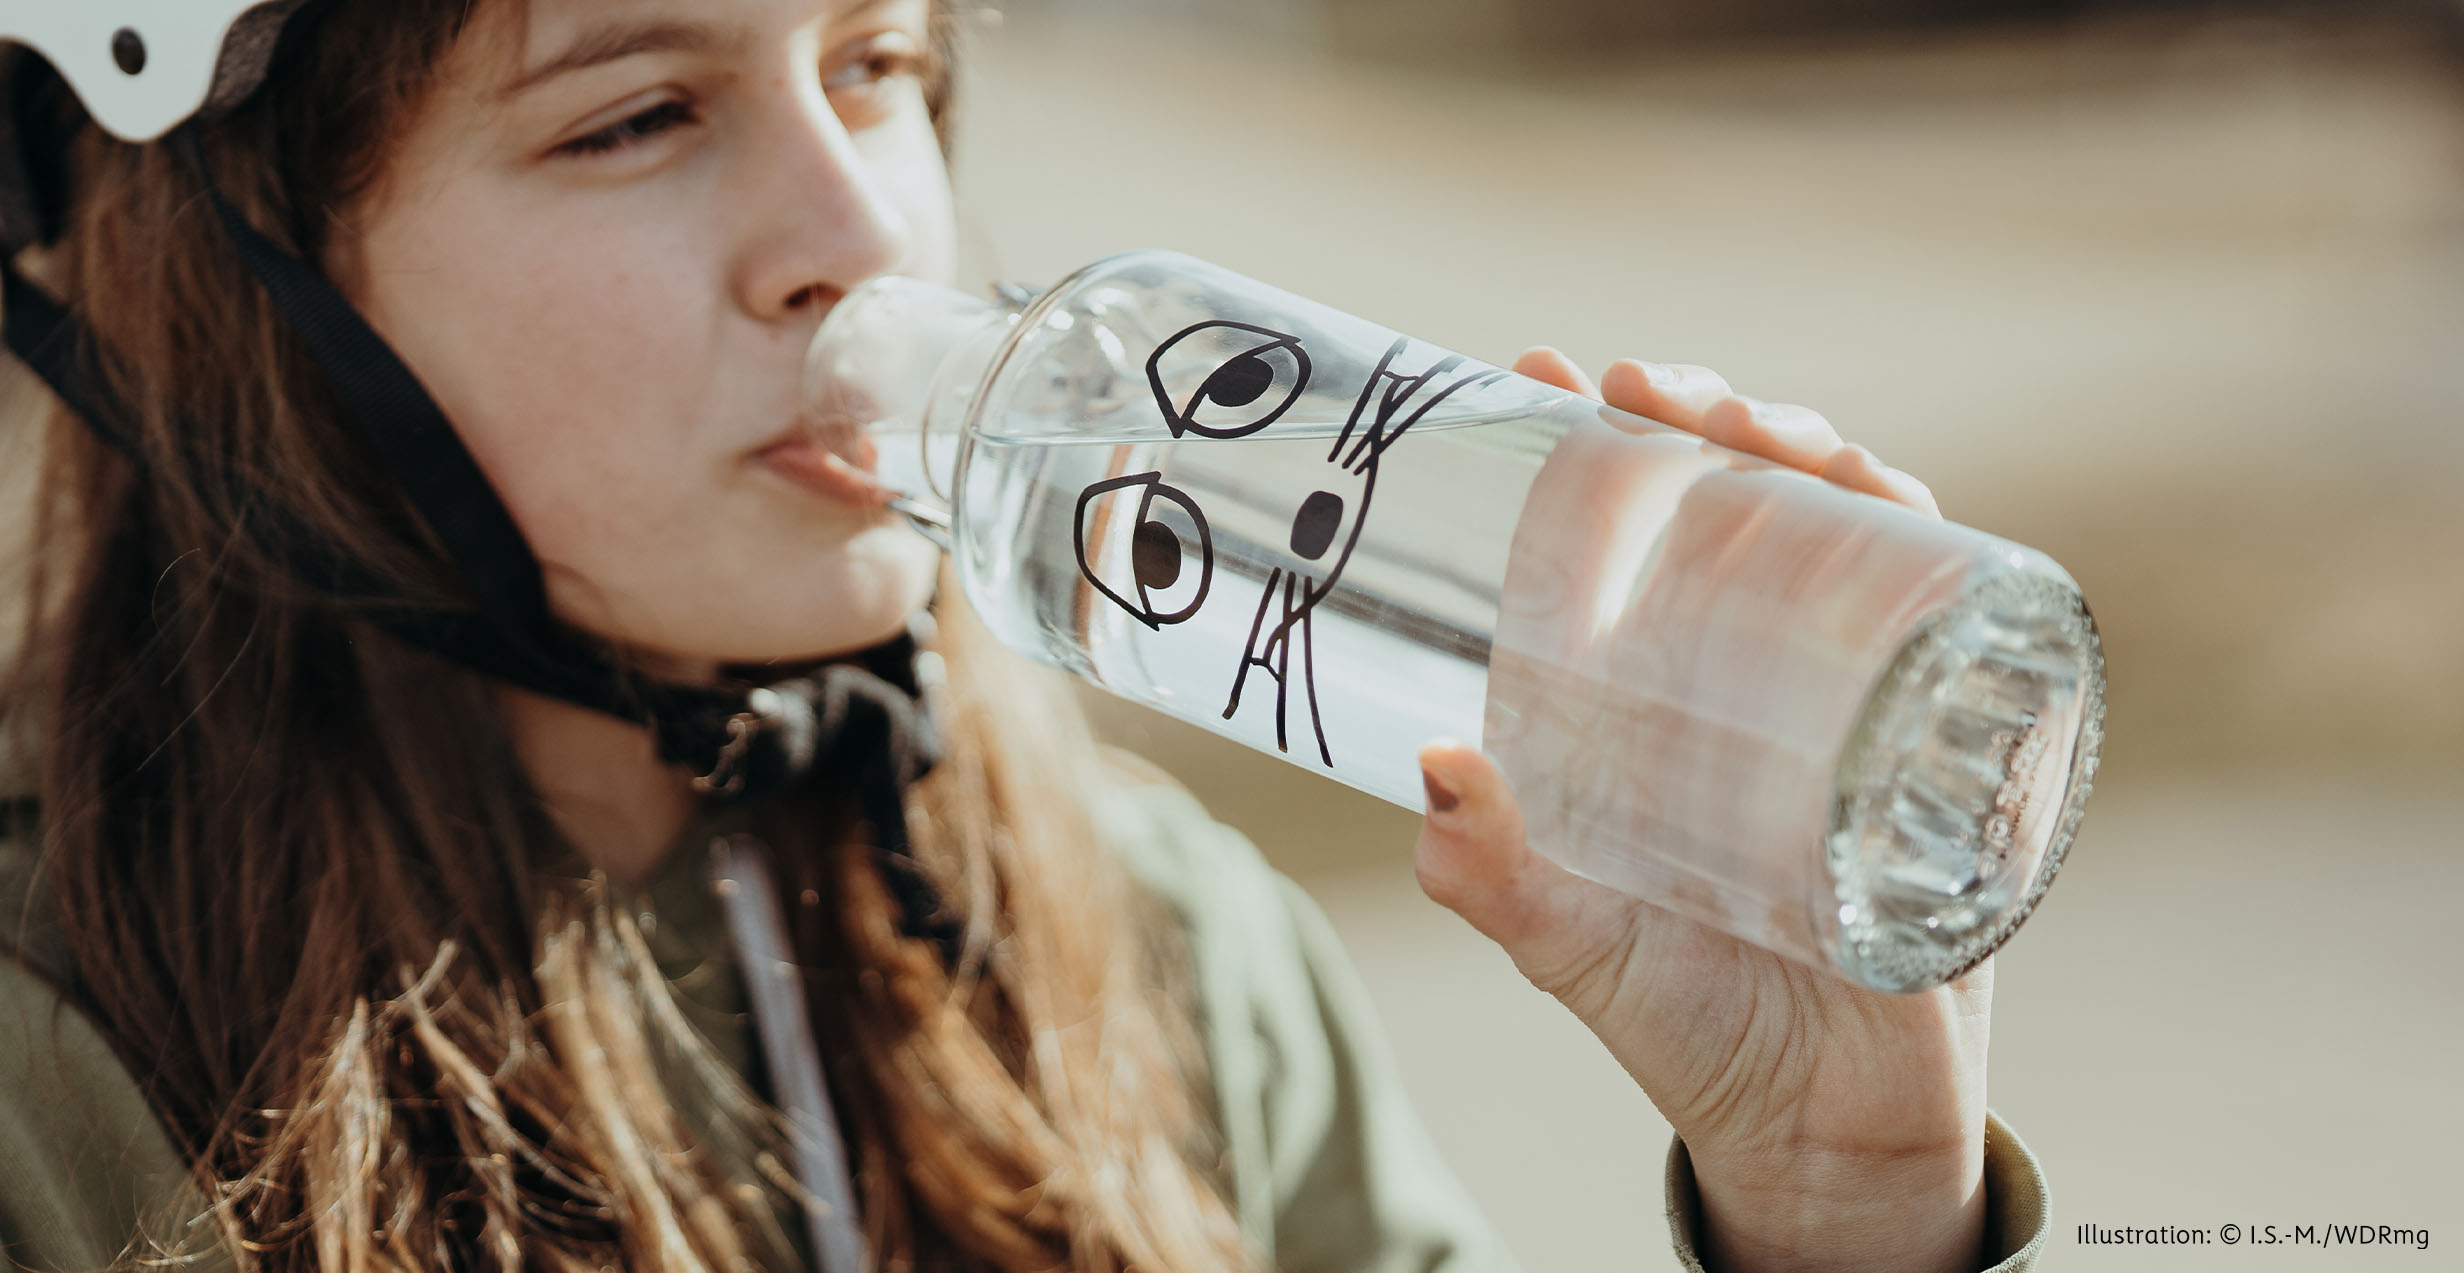 leitungswasser-trinken-soulbottles-soulblog